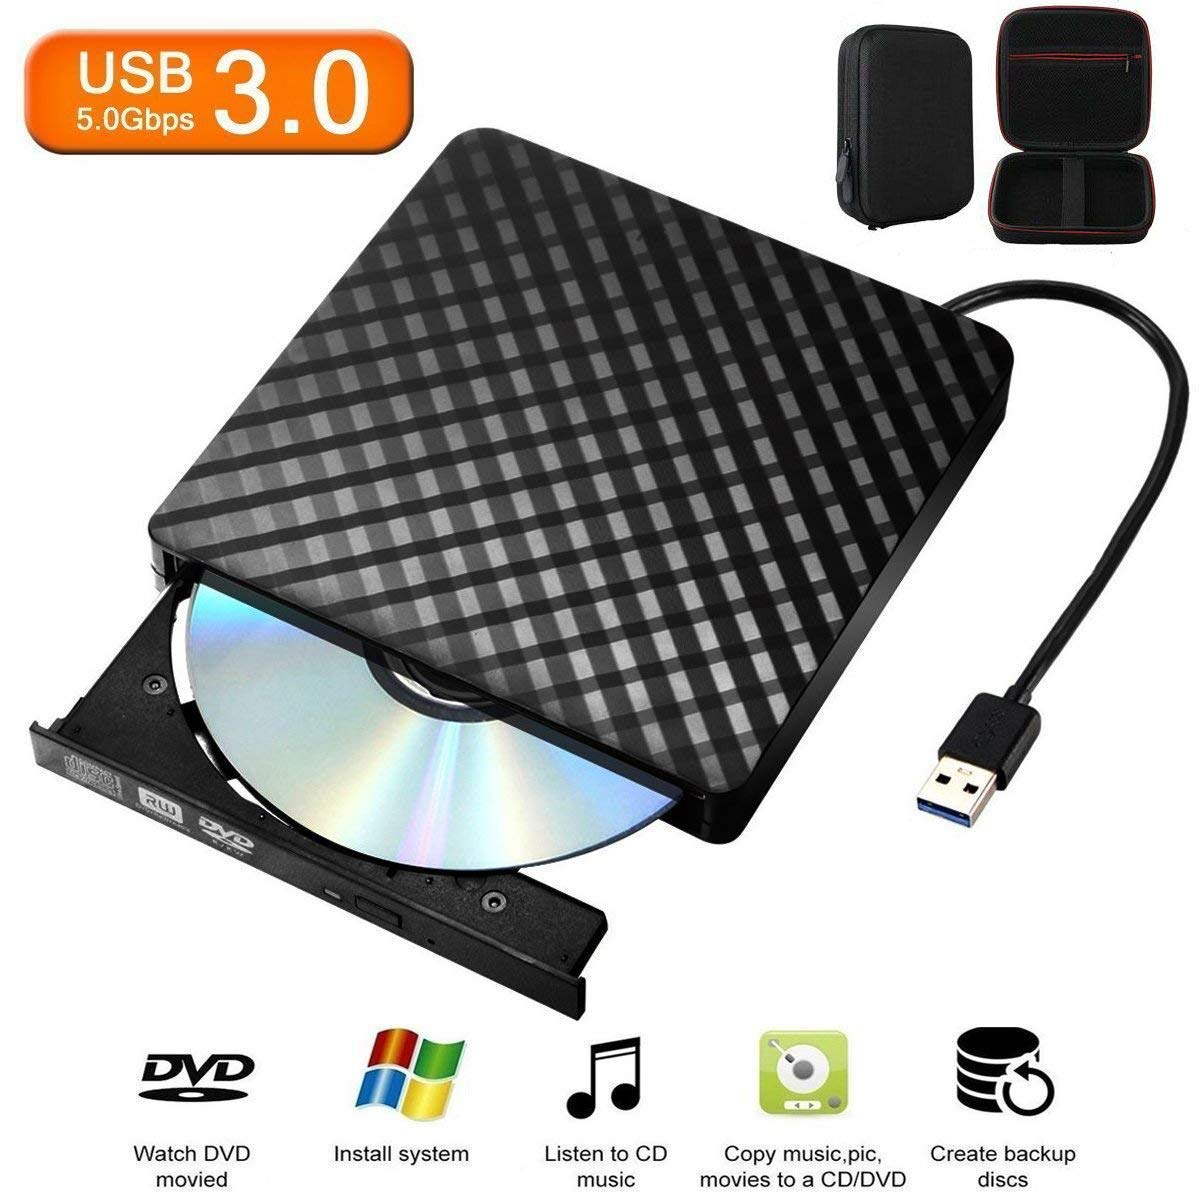 External CD/DVD Drive for Laptop & MacBook, with USB 3.0 Plug for Quick Data Transfer, Fast Writing & Reading Speed 8 X DVD –R, Ultra Thin (CD/DVD Driver + Bag) - Tecnugiz